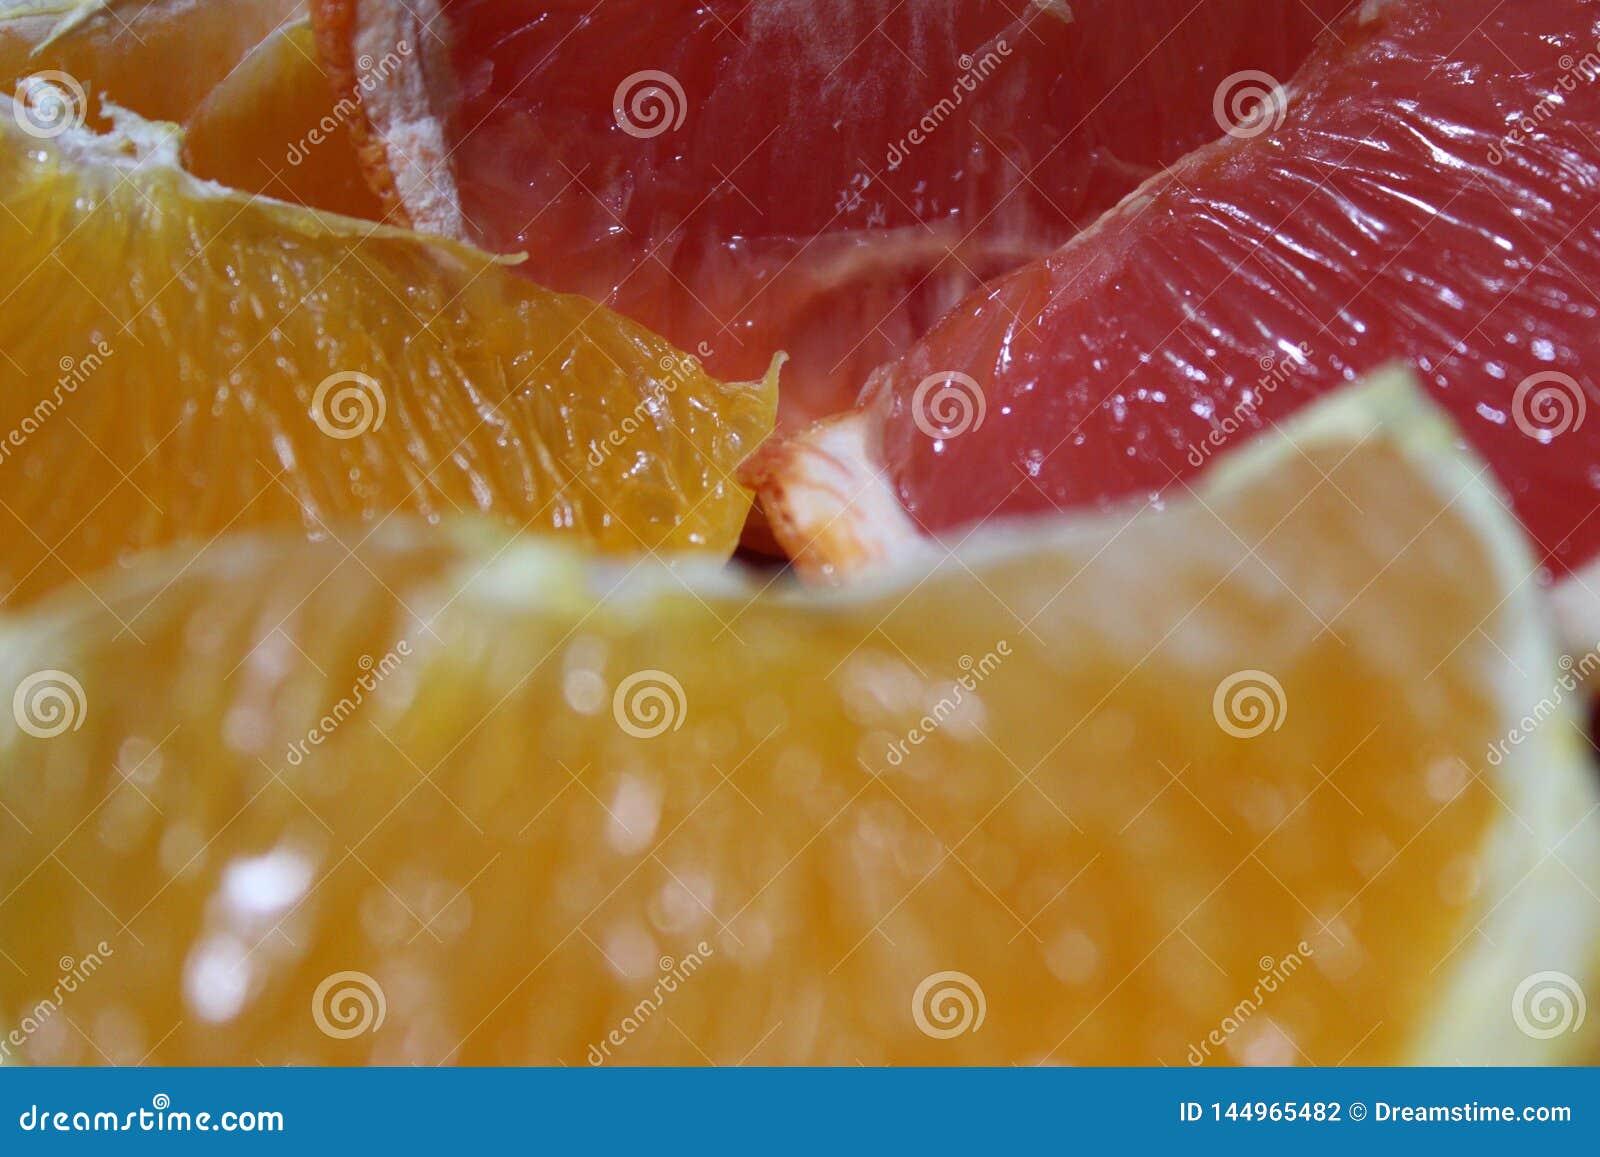 Close up of Oranges and Grapefruit